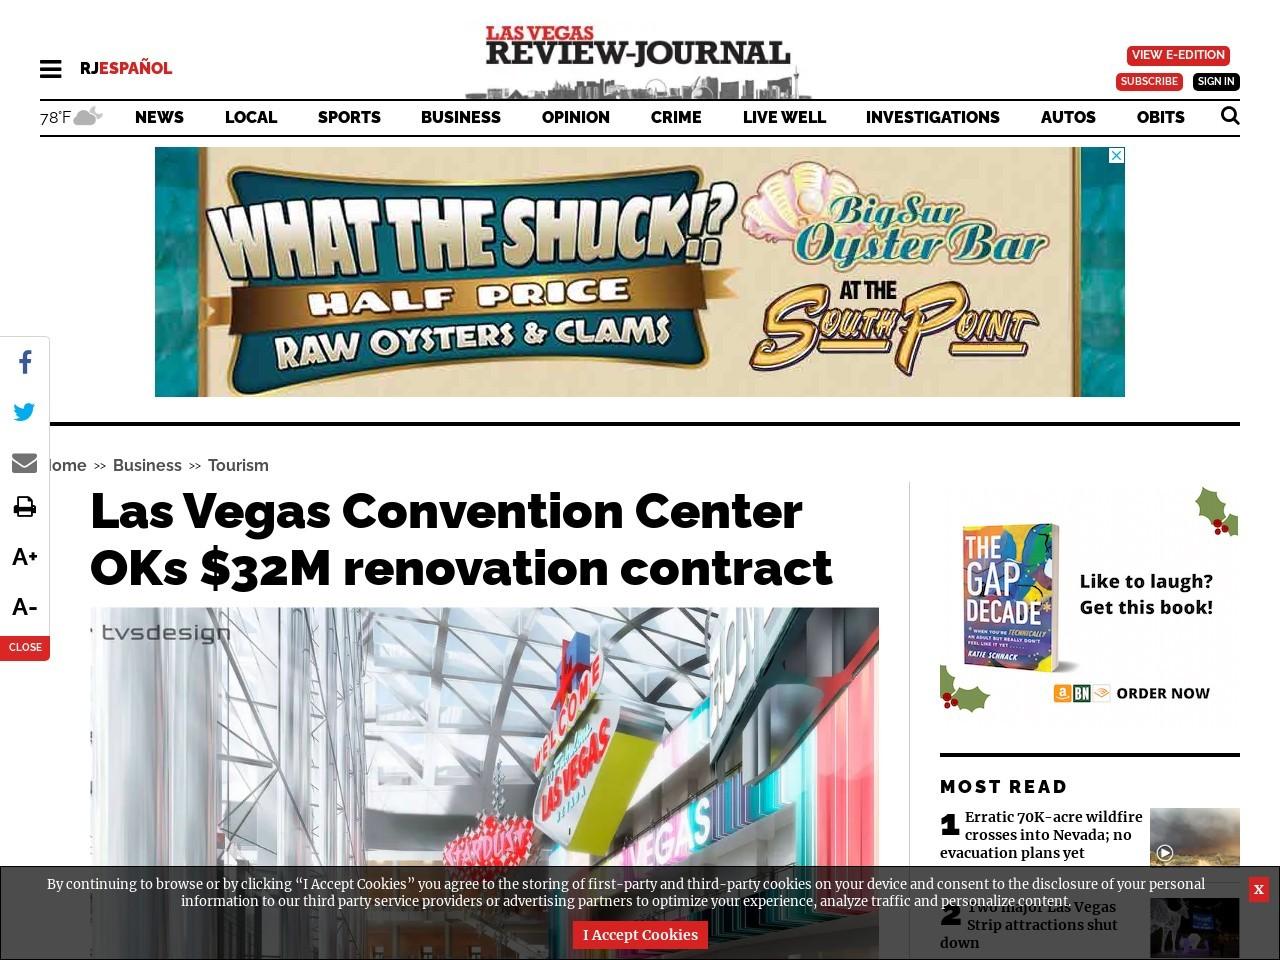 Las Vegas Convention Center OKs $32M renovation contract